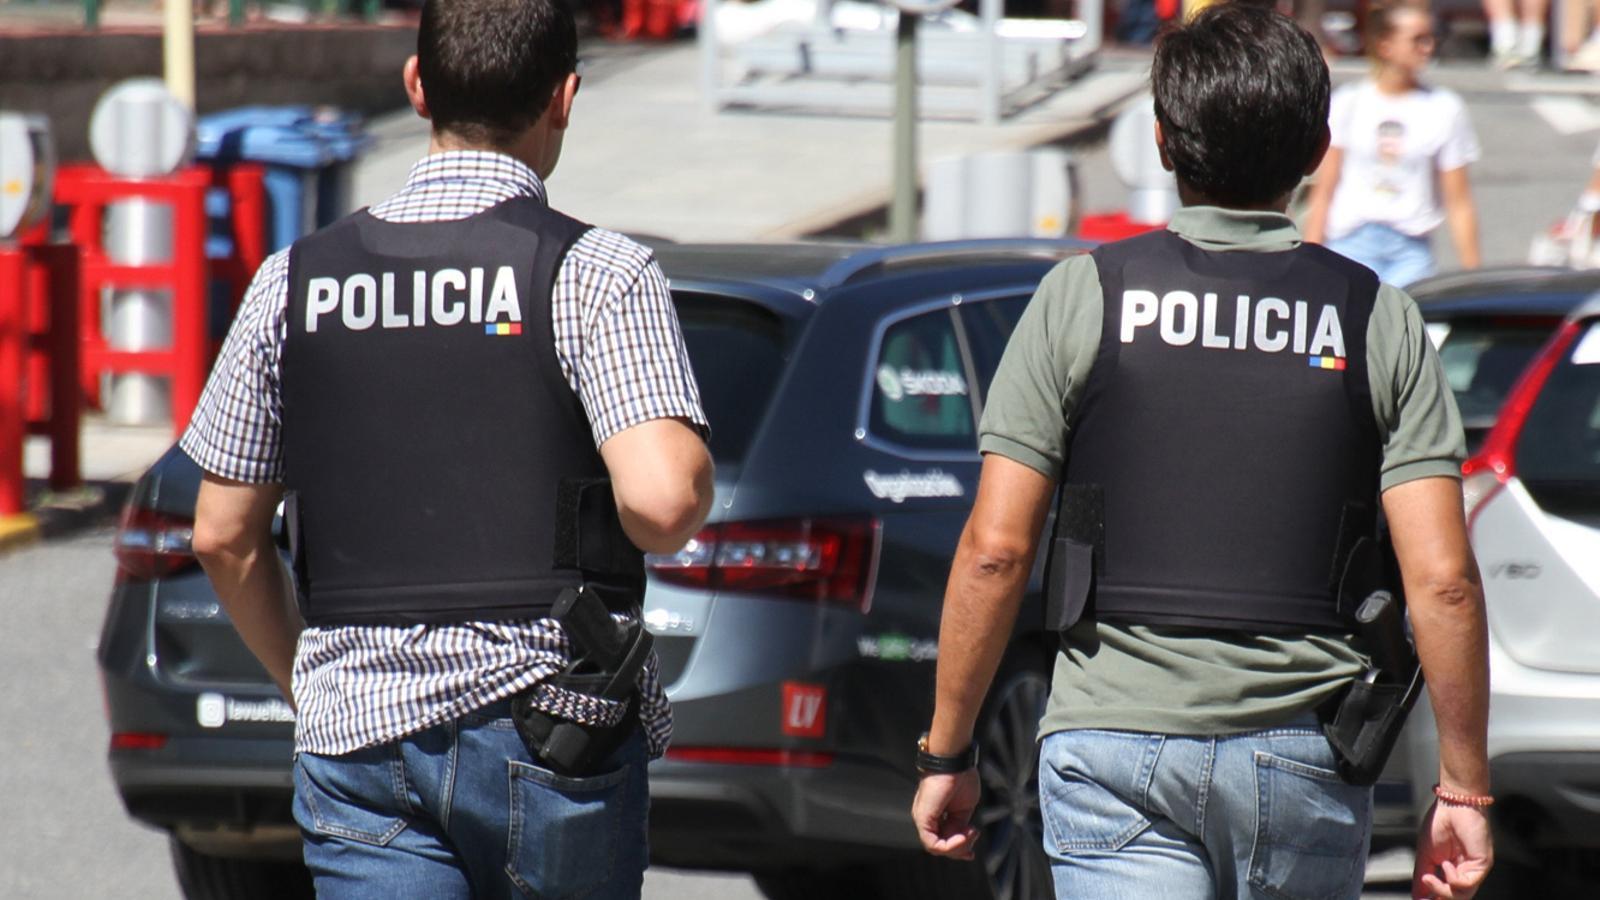 Dos agents de policia. / POLICIA D'ANDORRA